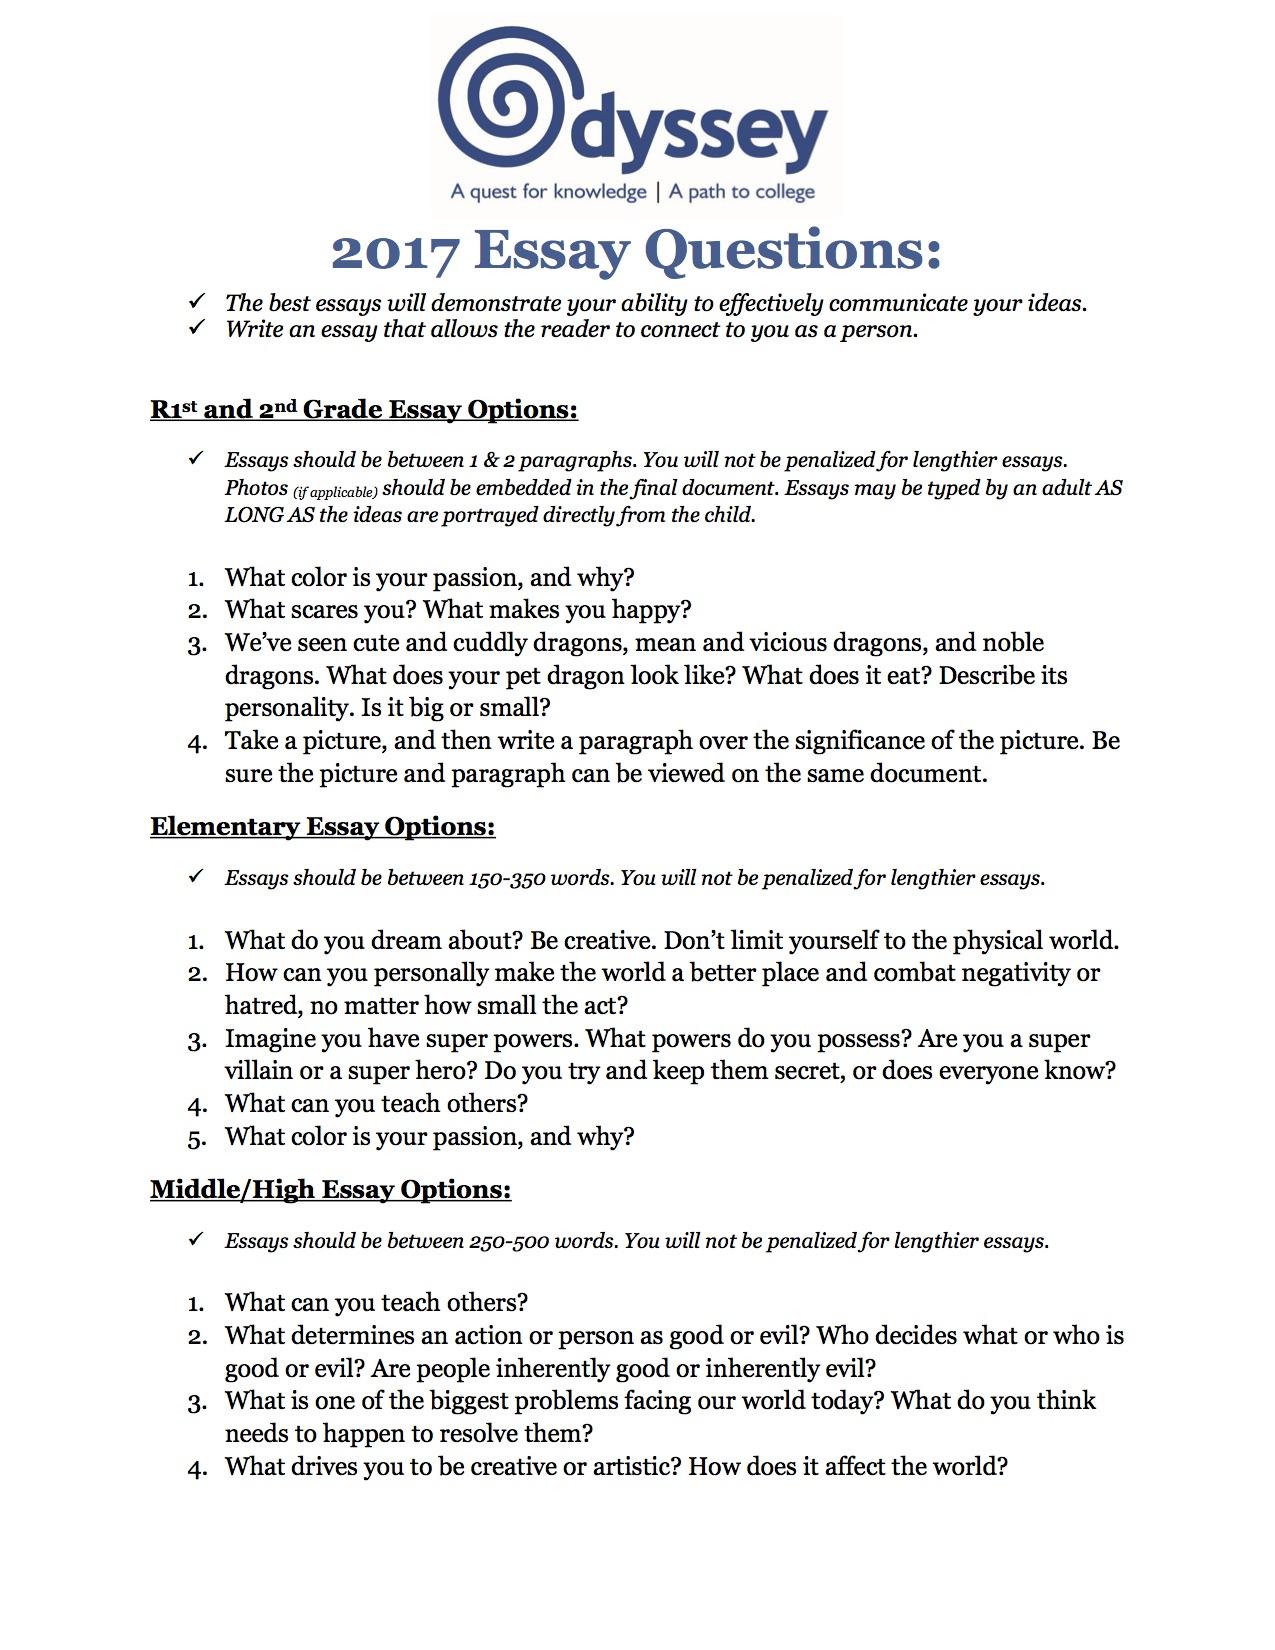 011 Essay Example Topics For An 5829f1d2c75f9a7c5588b1c6 Proposed20essay20topics202017 Unbelievable Interesting Expository Full